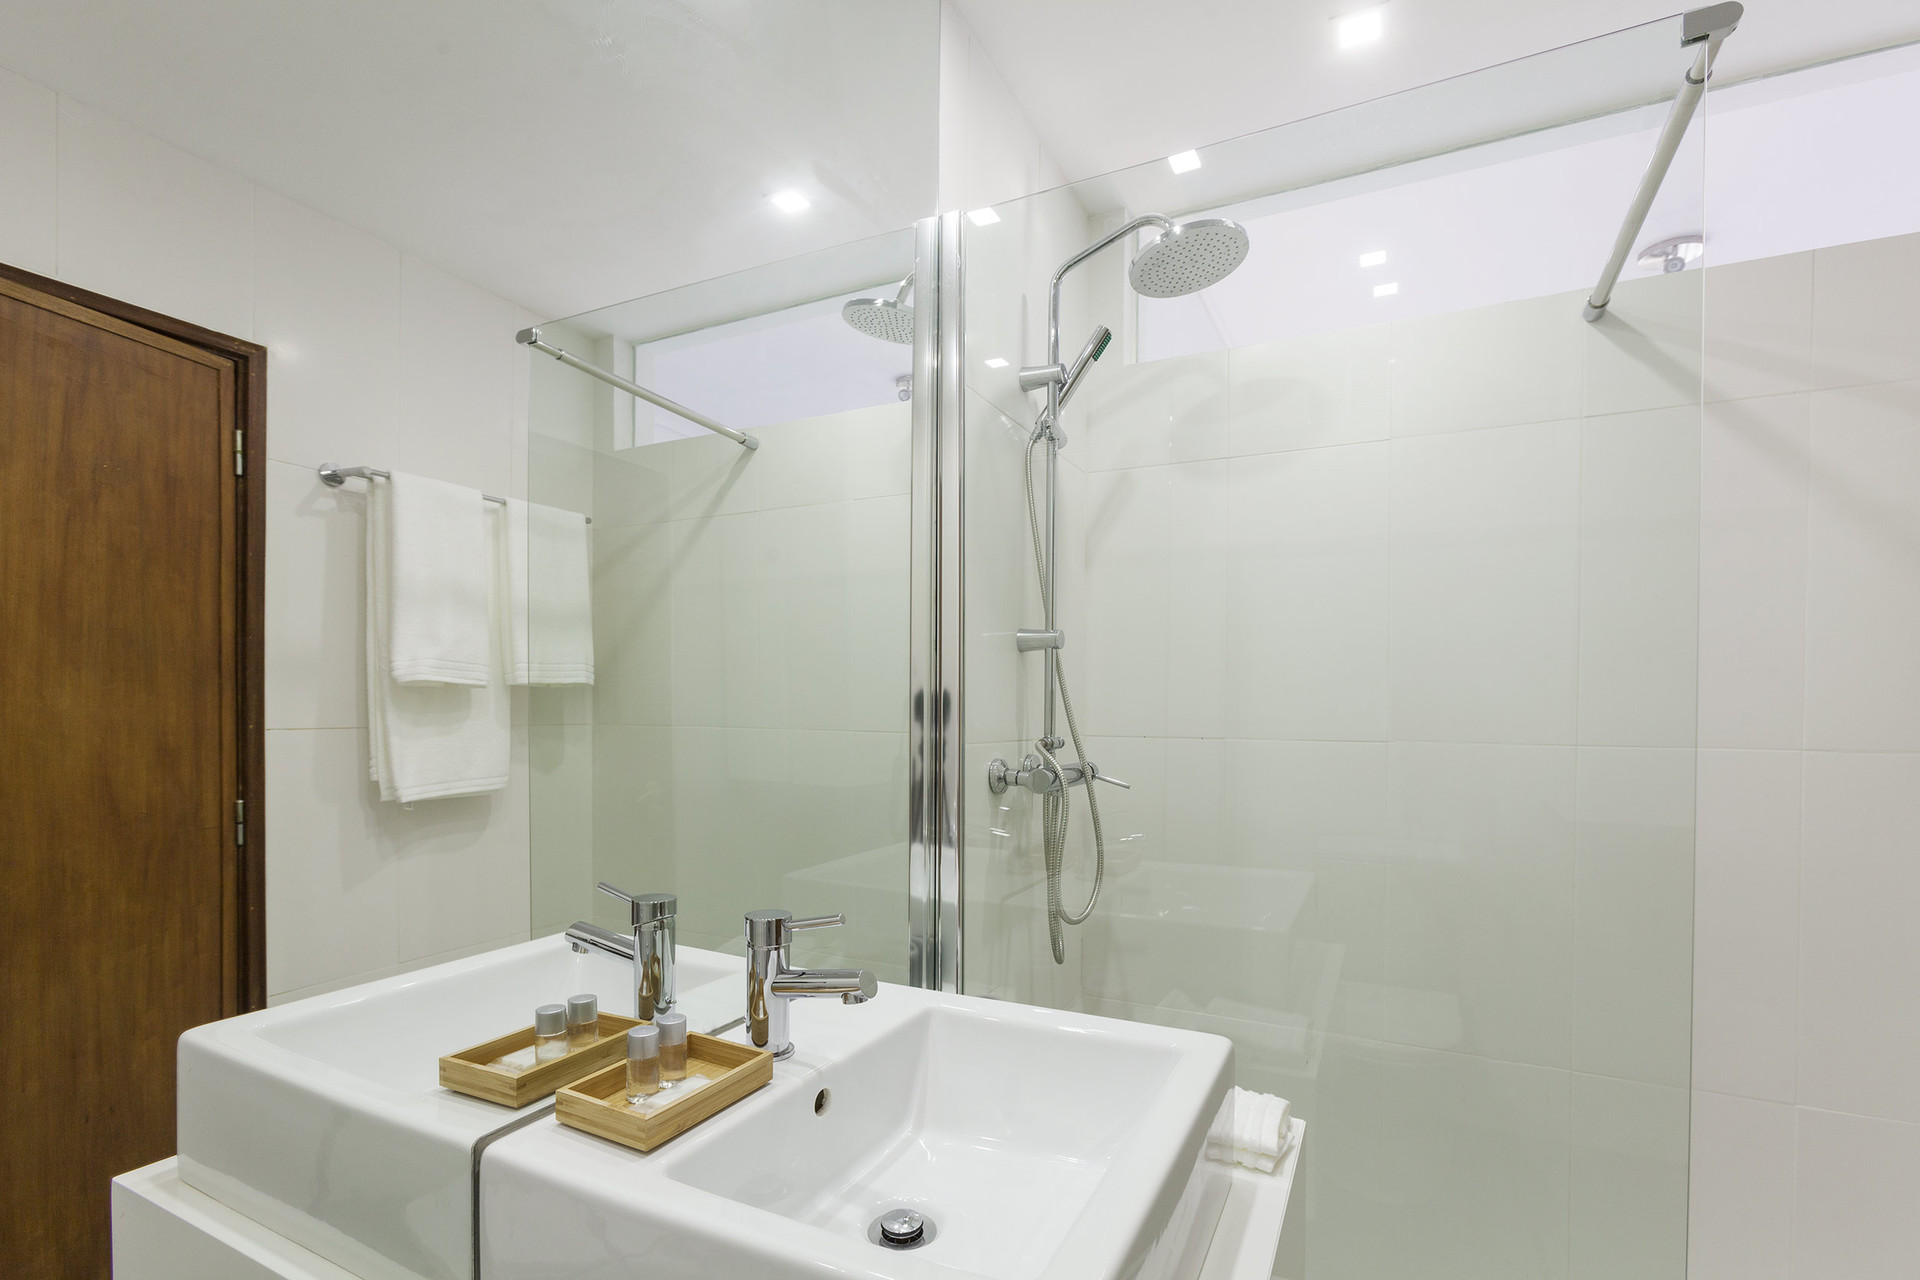 Entire Apartment 1 Bedroom Bathroom Living Room